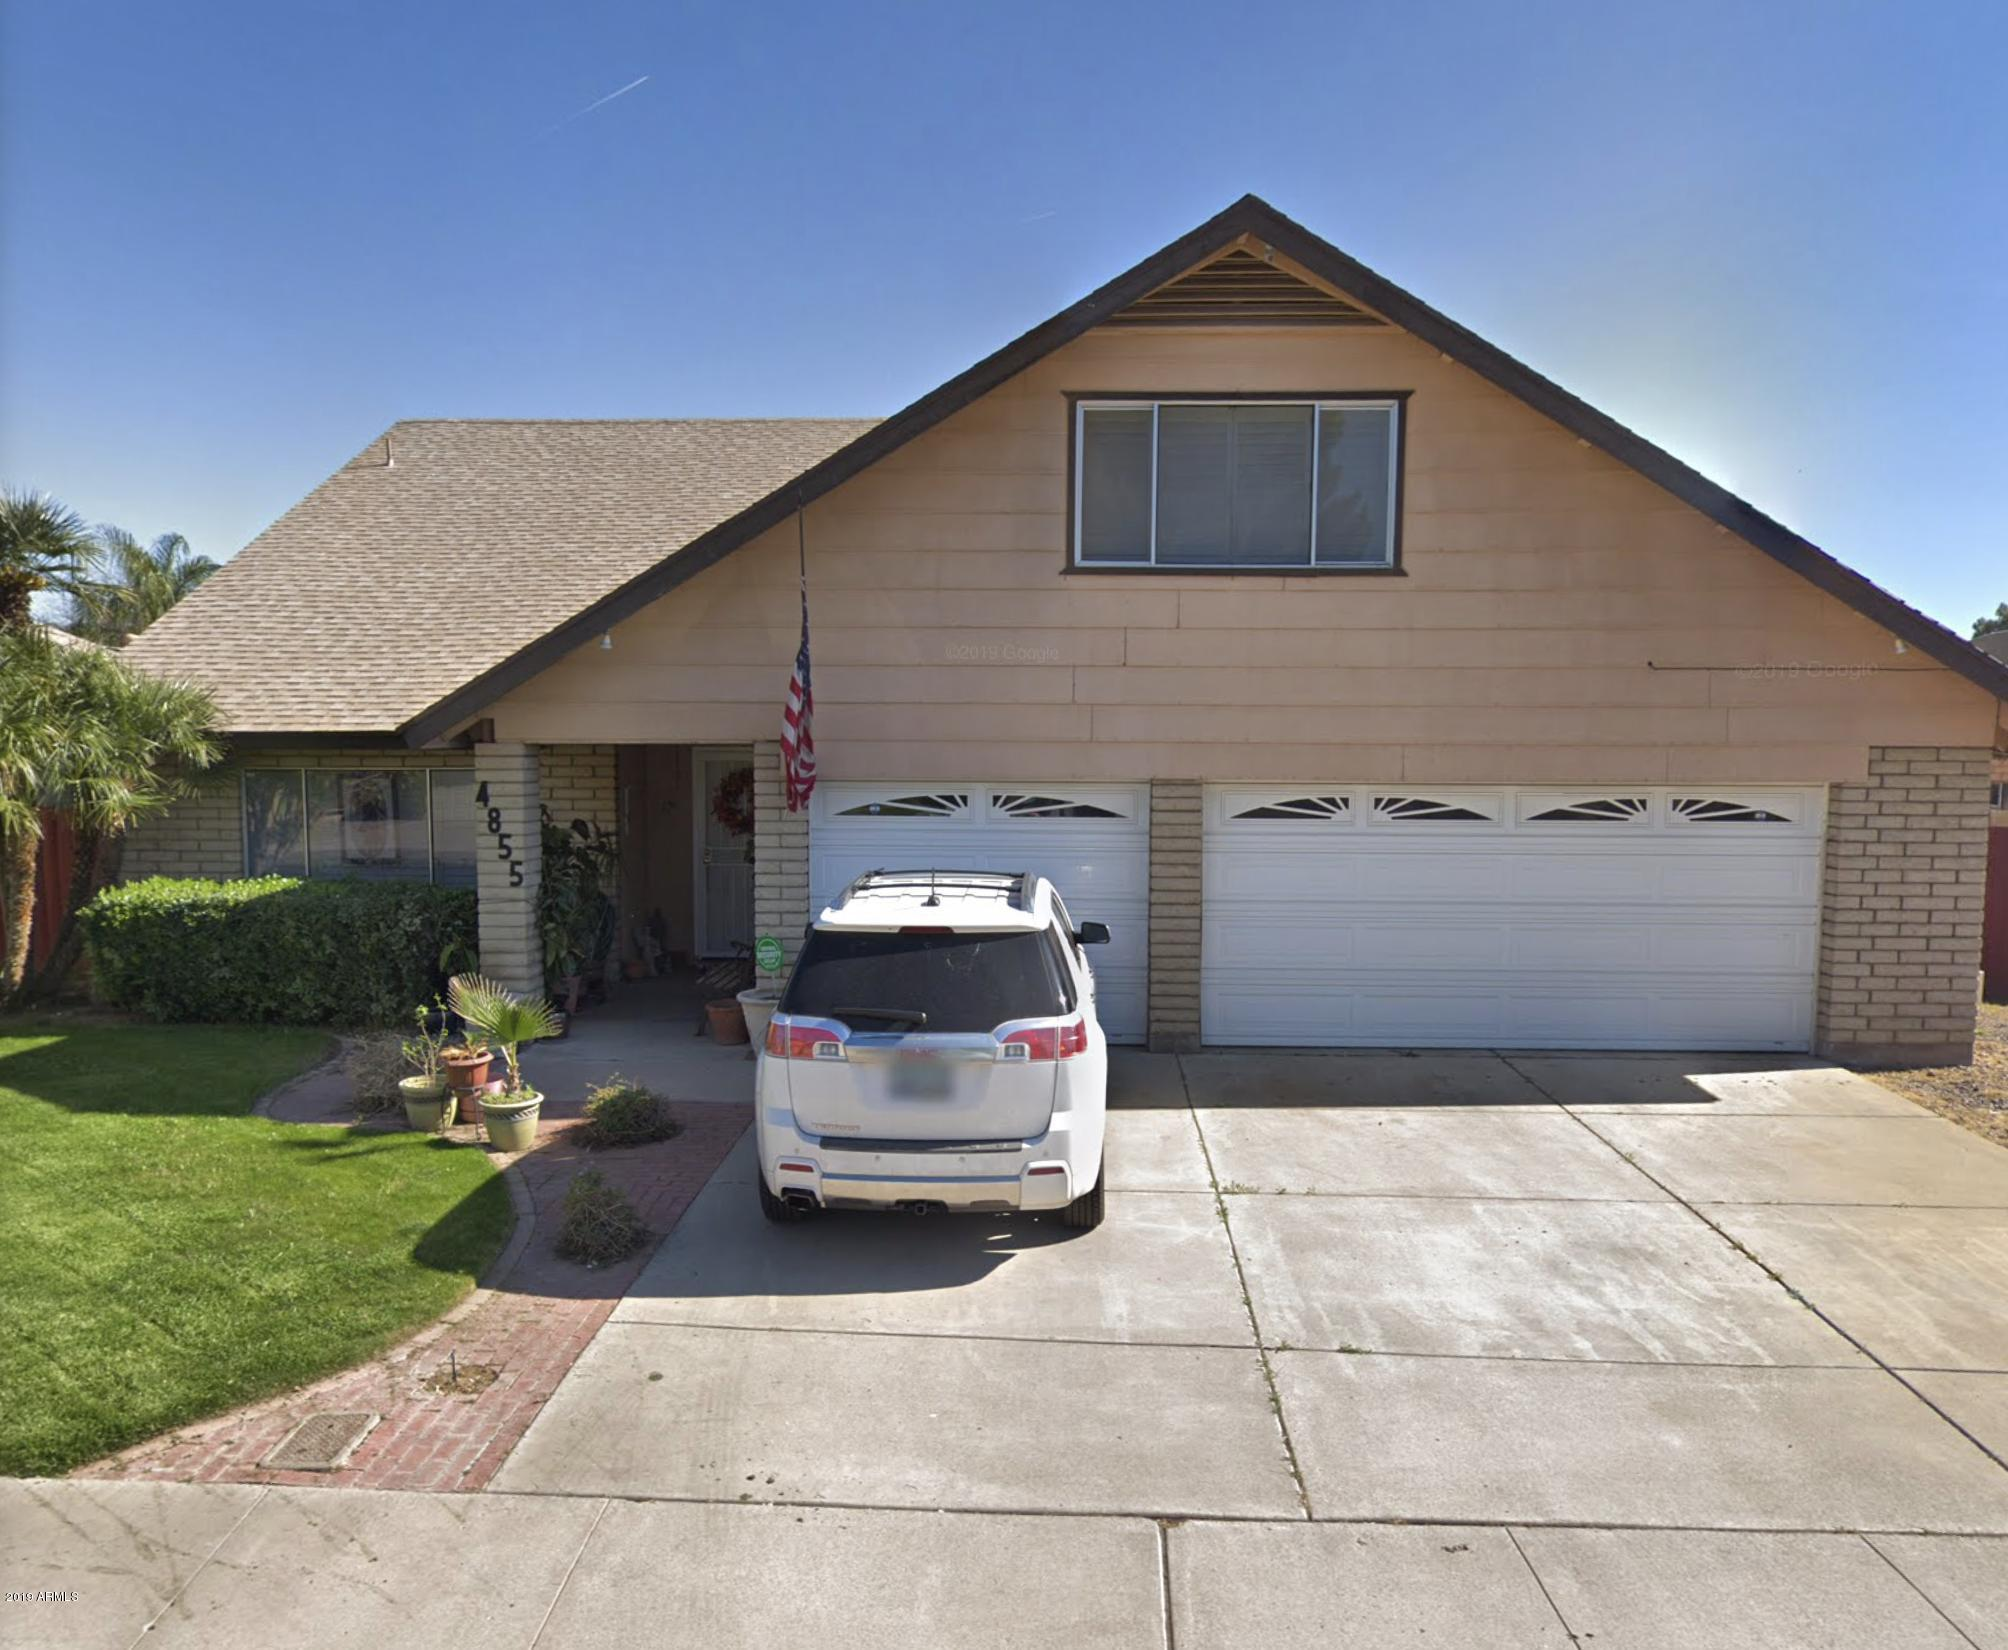 MLS 5963827 4855 W DIANA Avenue, Glendale, AZ 85302 Glendale AZ Short Sale